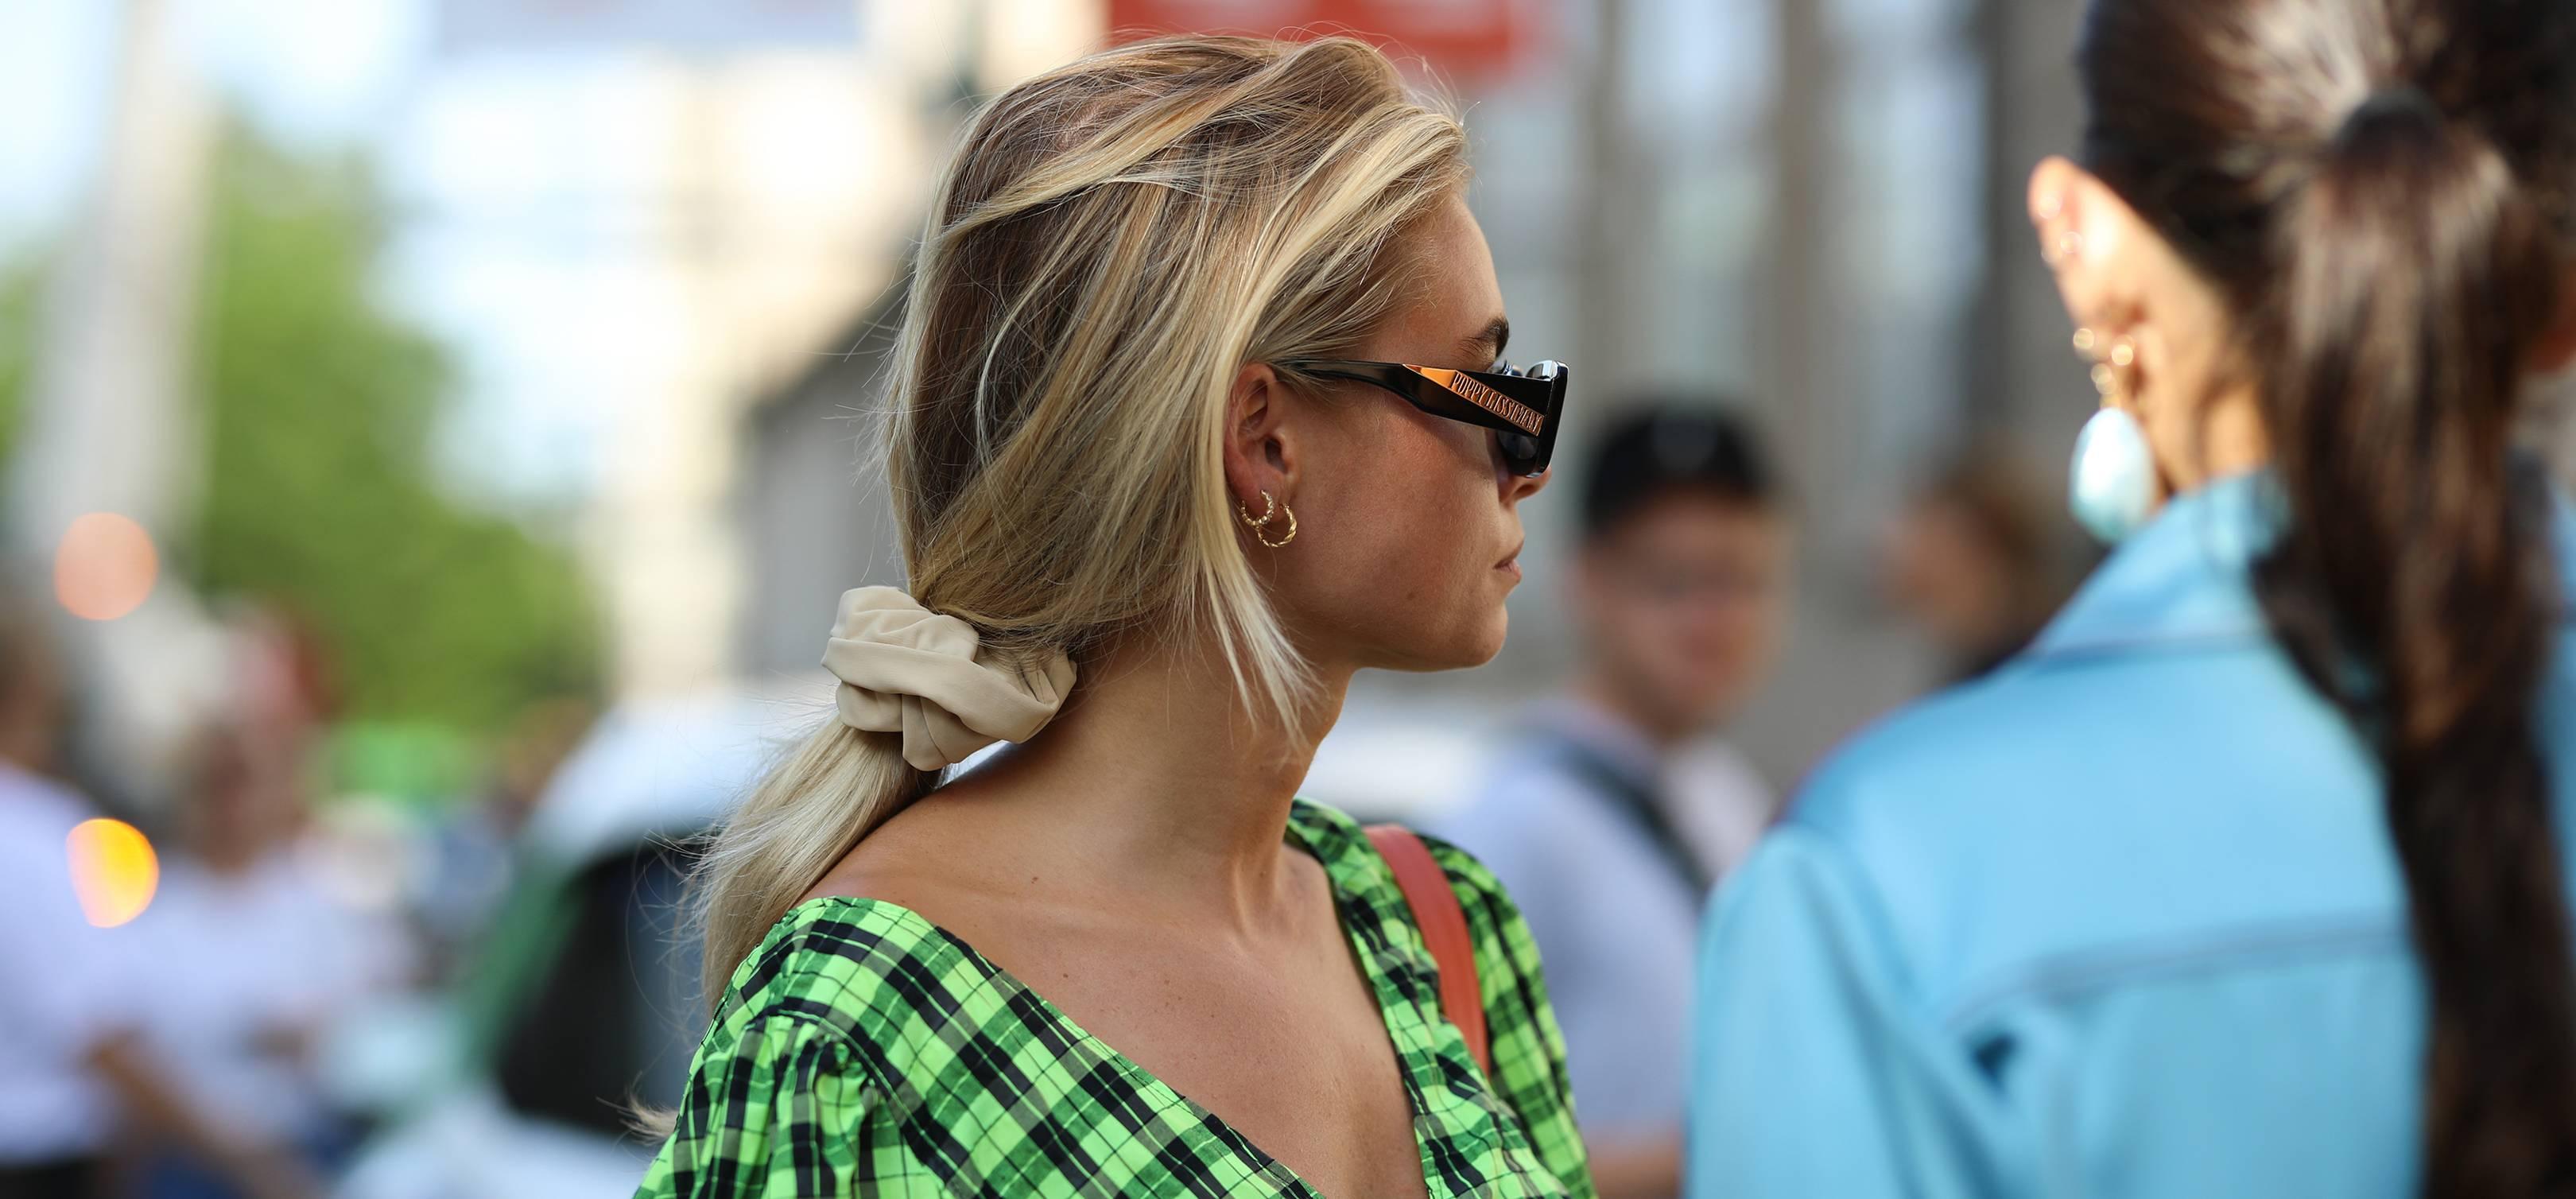 tips for healthier hair: trash the elastics